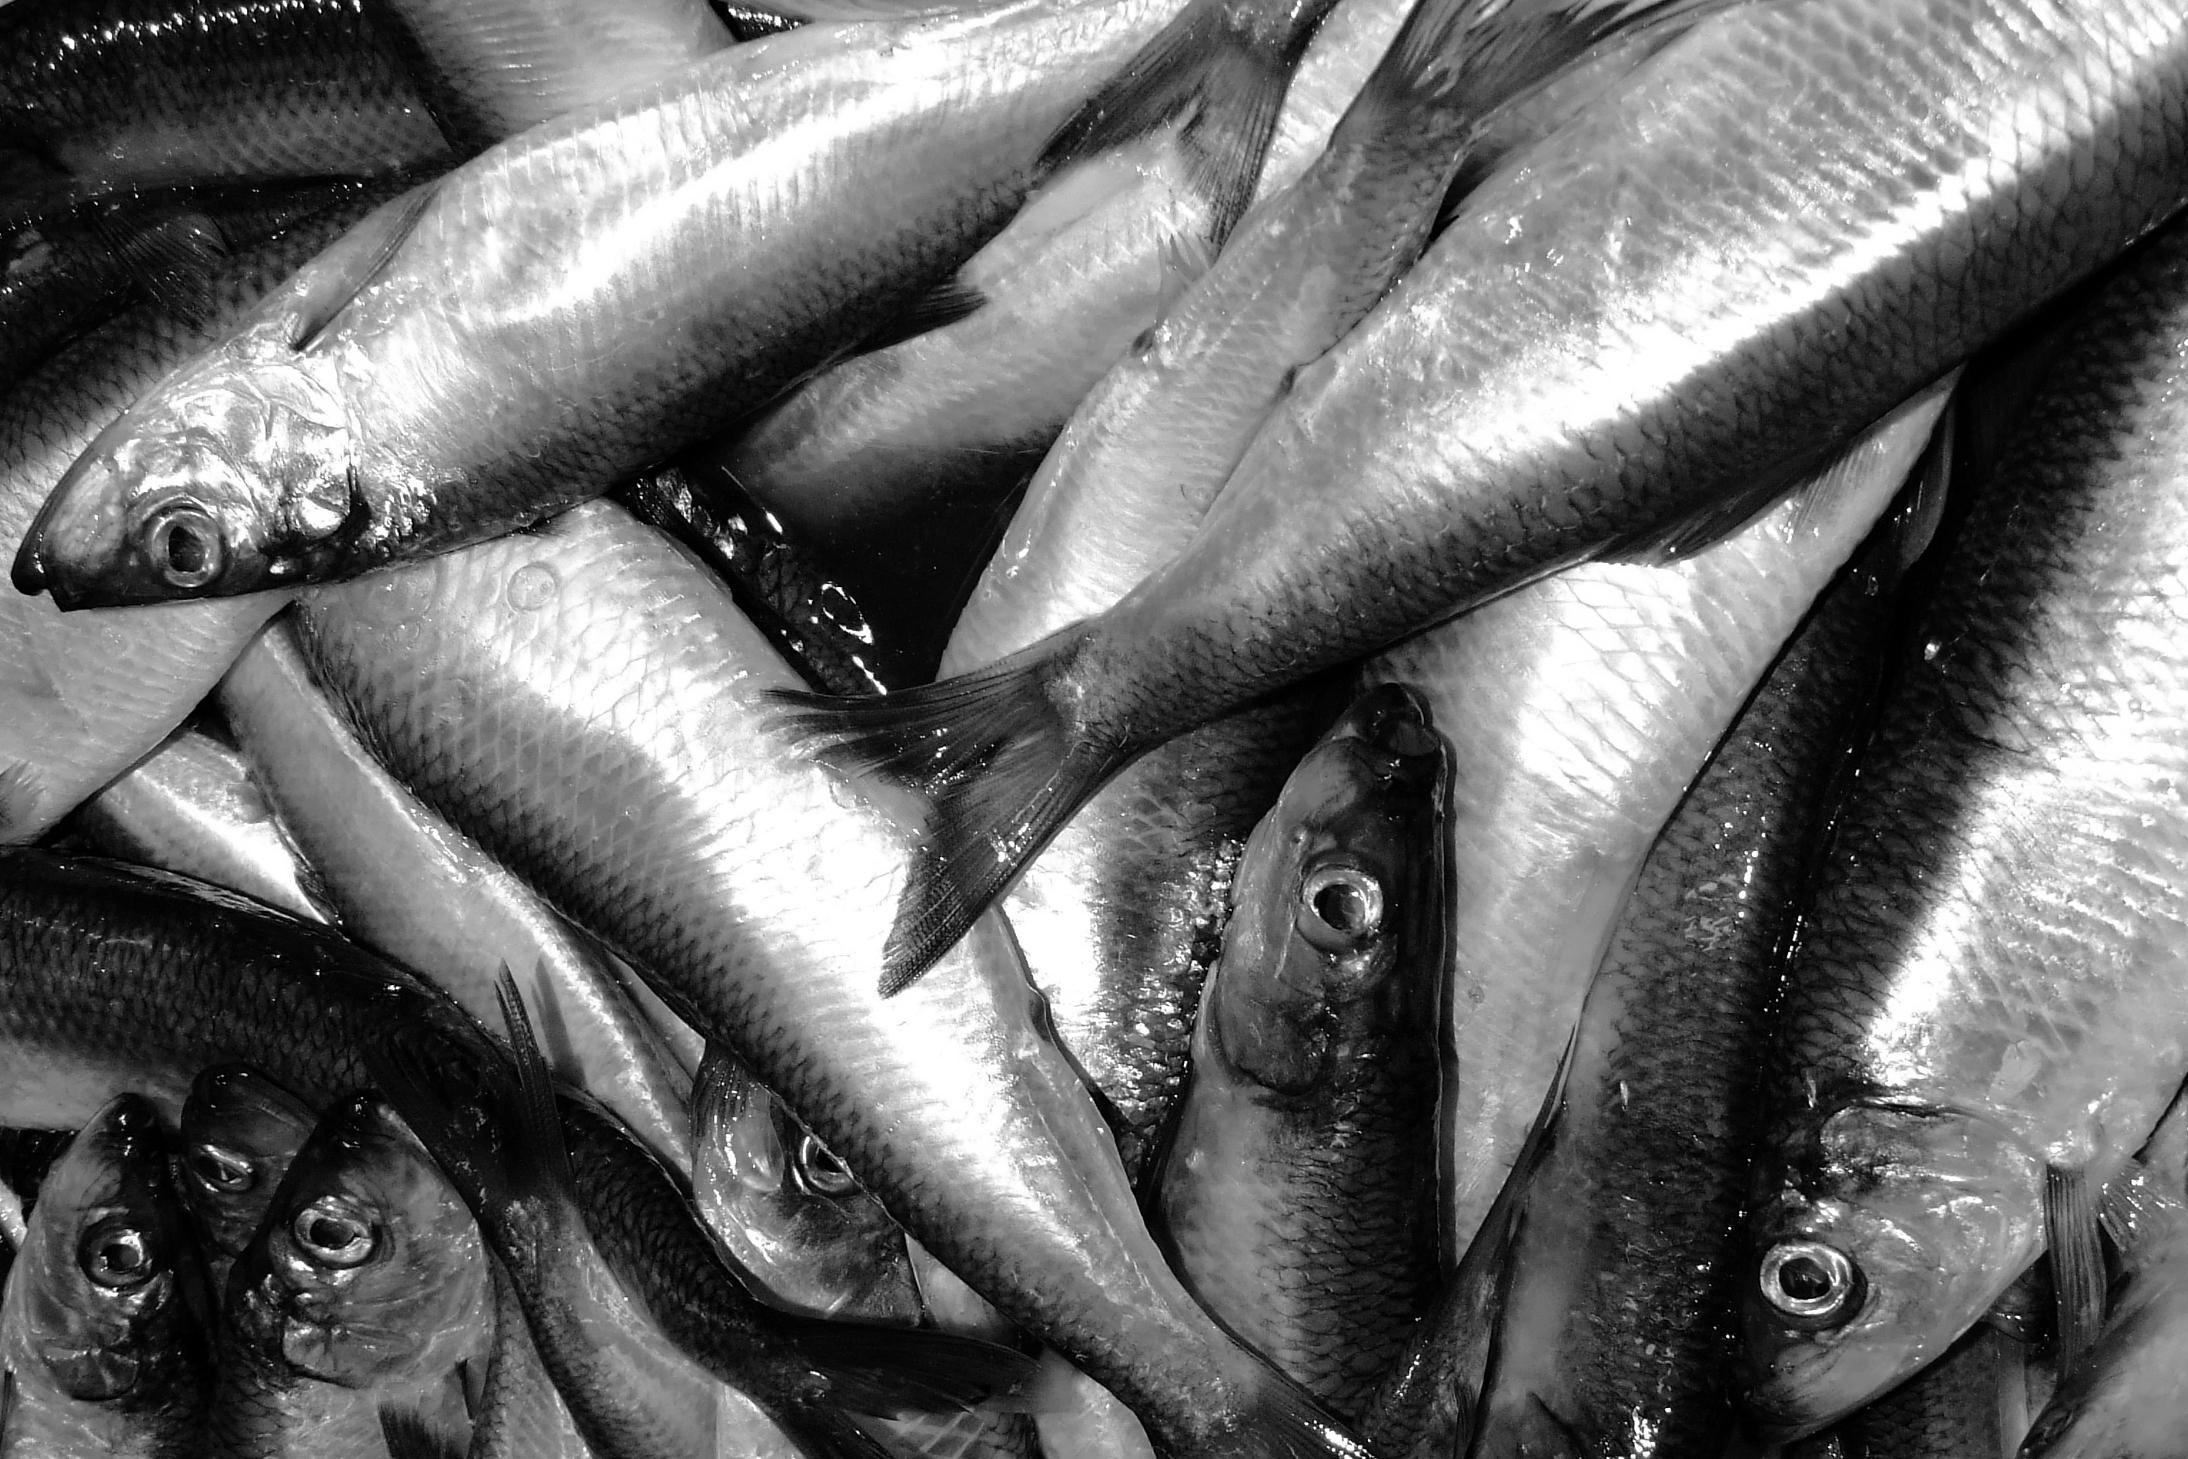 Scotia Garden Seafood Whole Herring